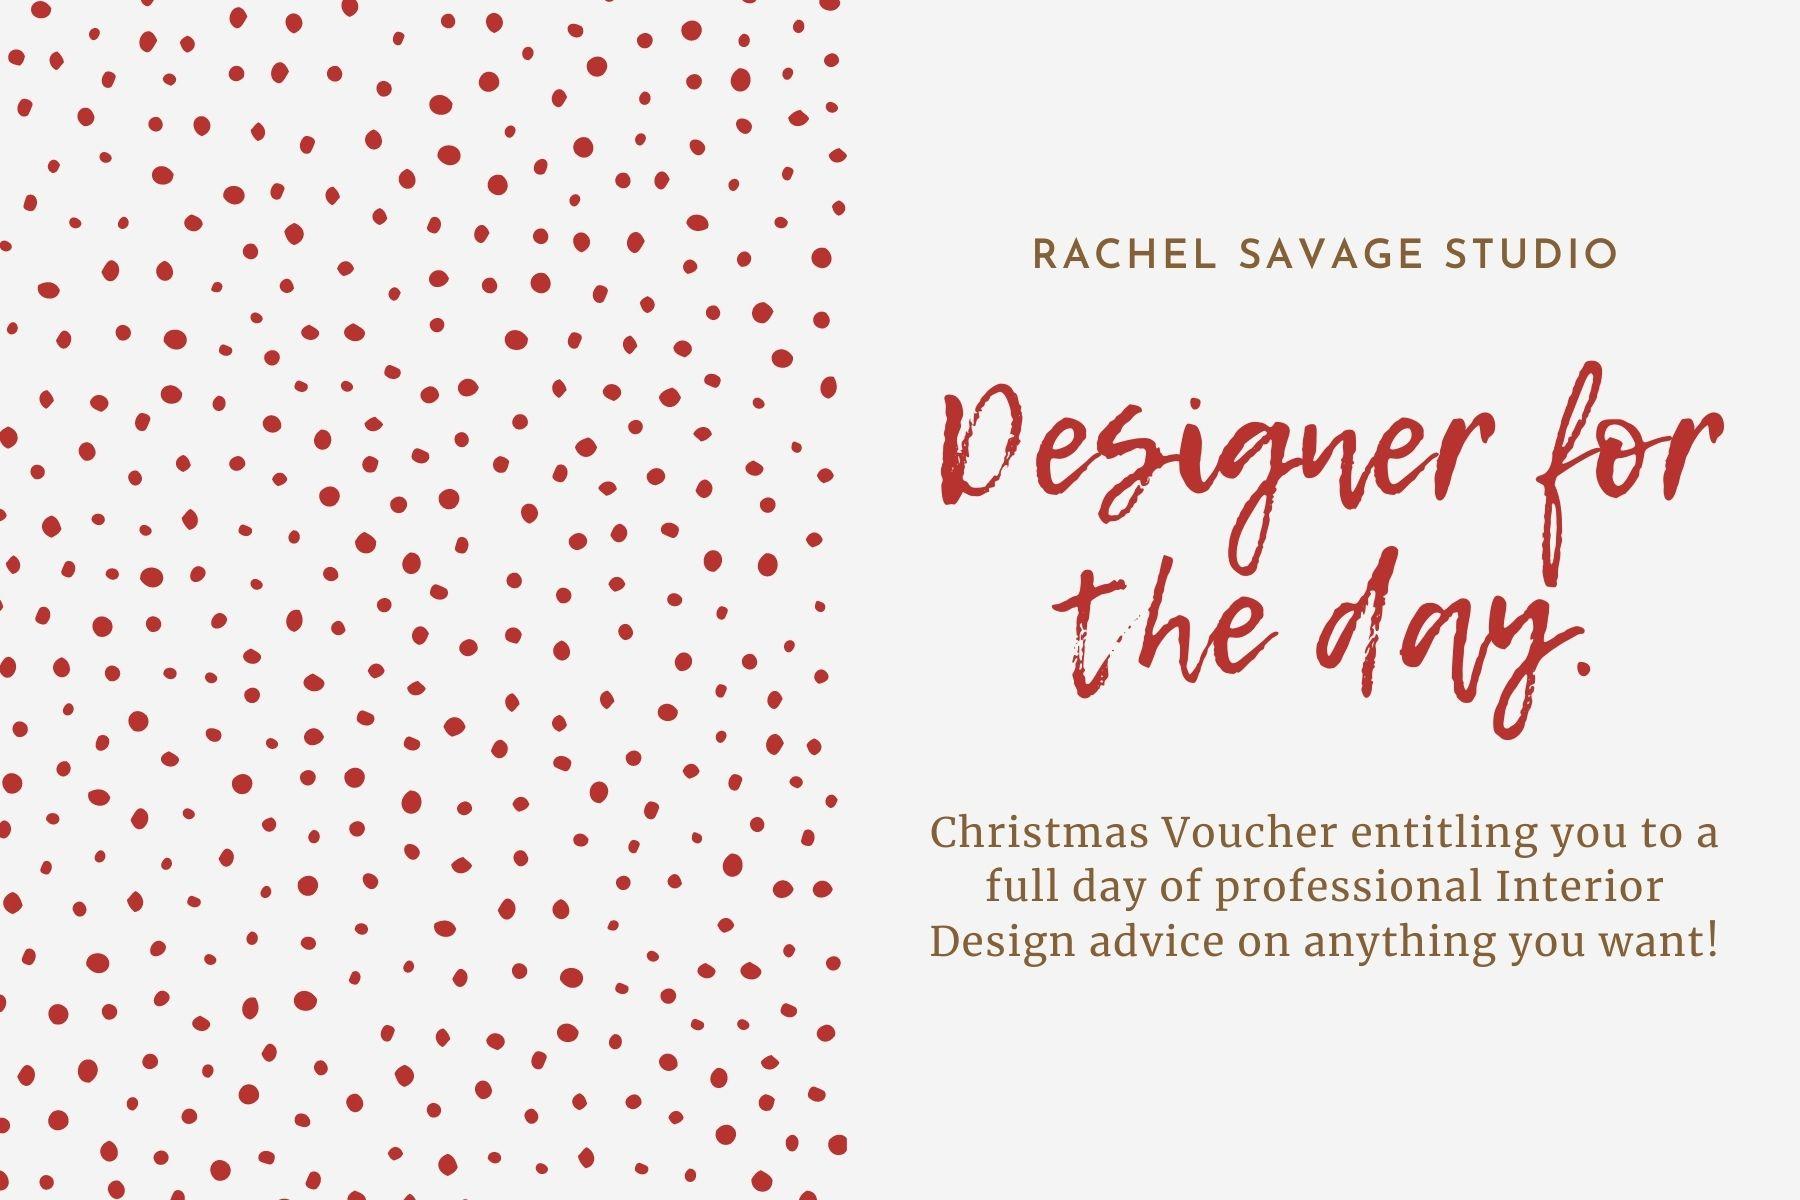 Rachel Savage Studio